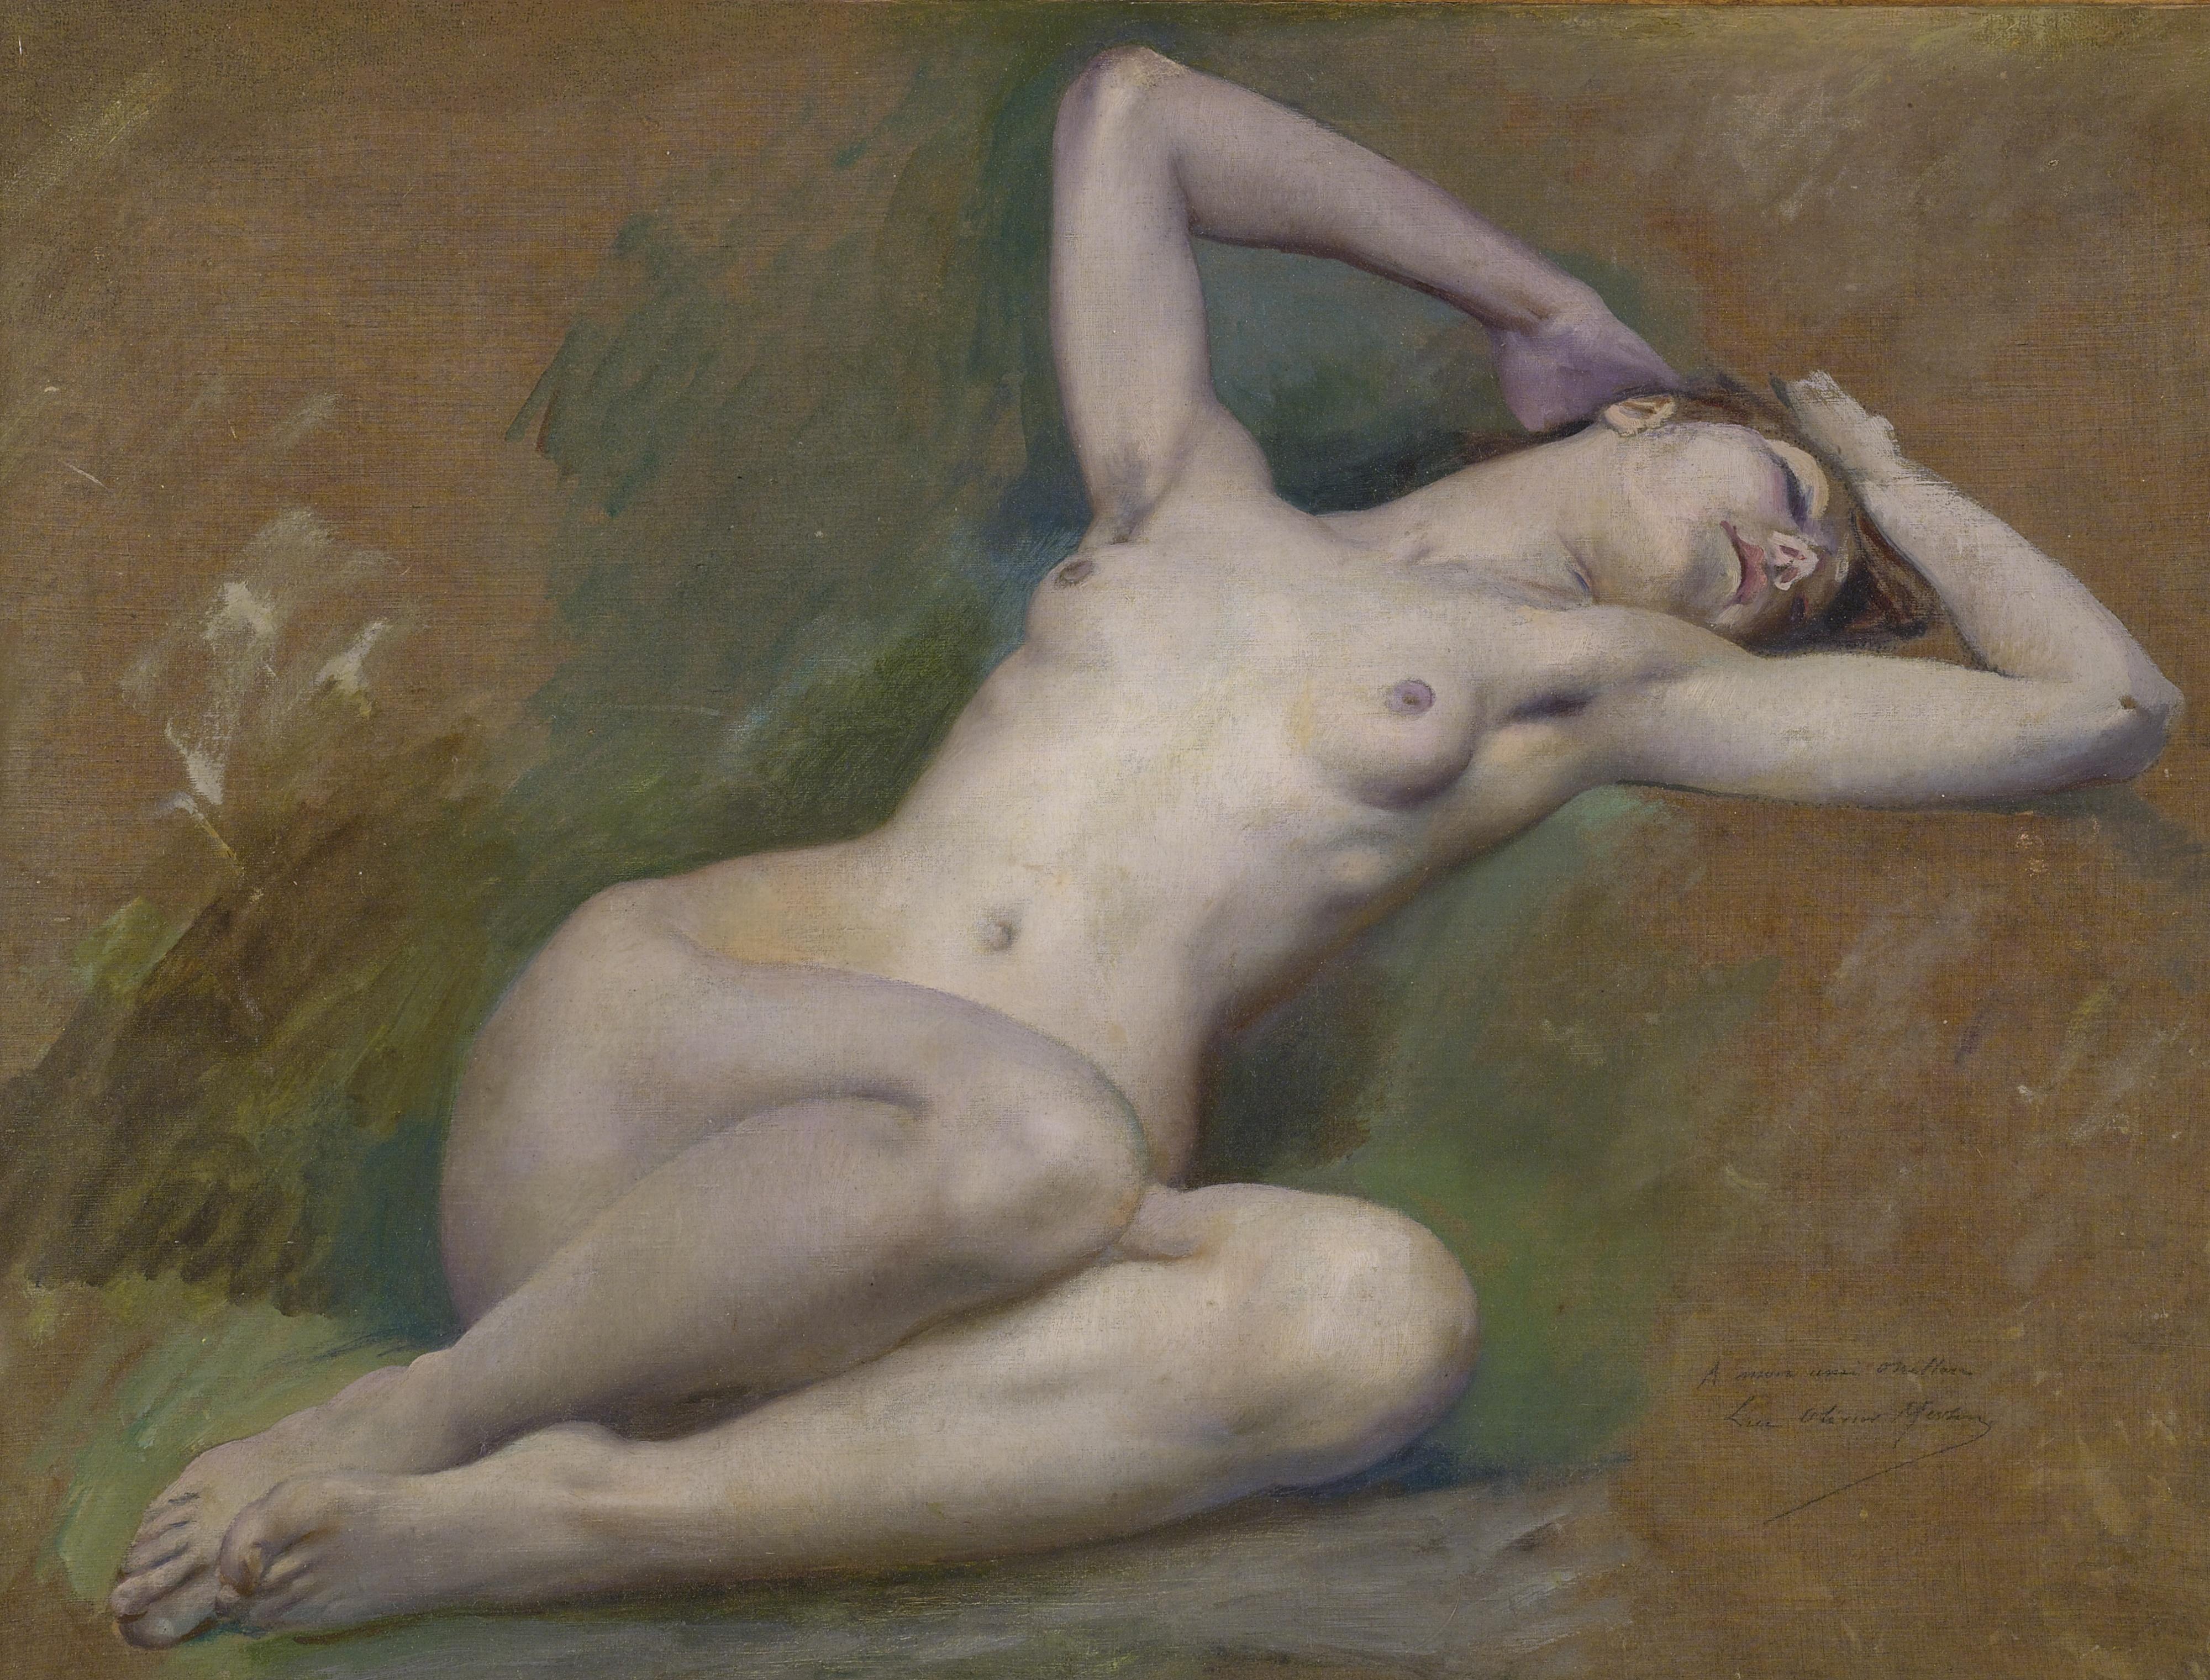 Luc Olivier Merson, 1846-1920. Этюд для фигуры Весны. 45.7 х 61 см. Частная коллекция